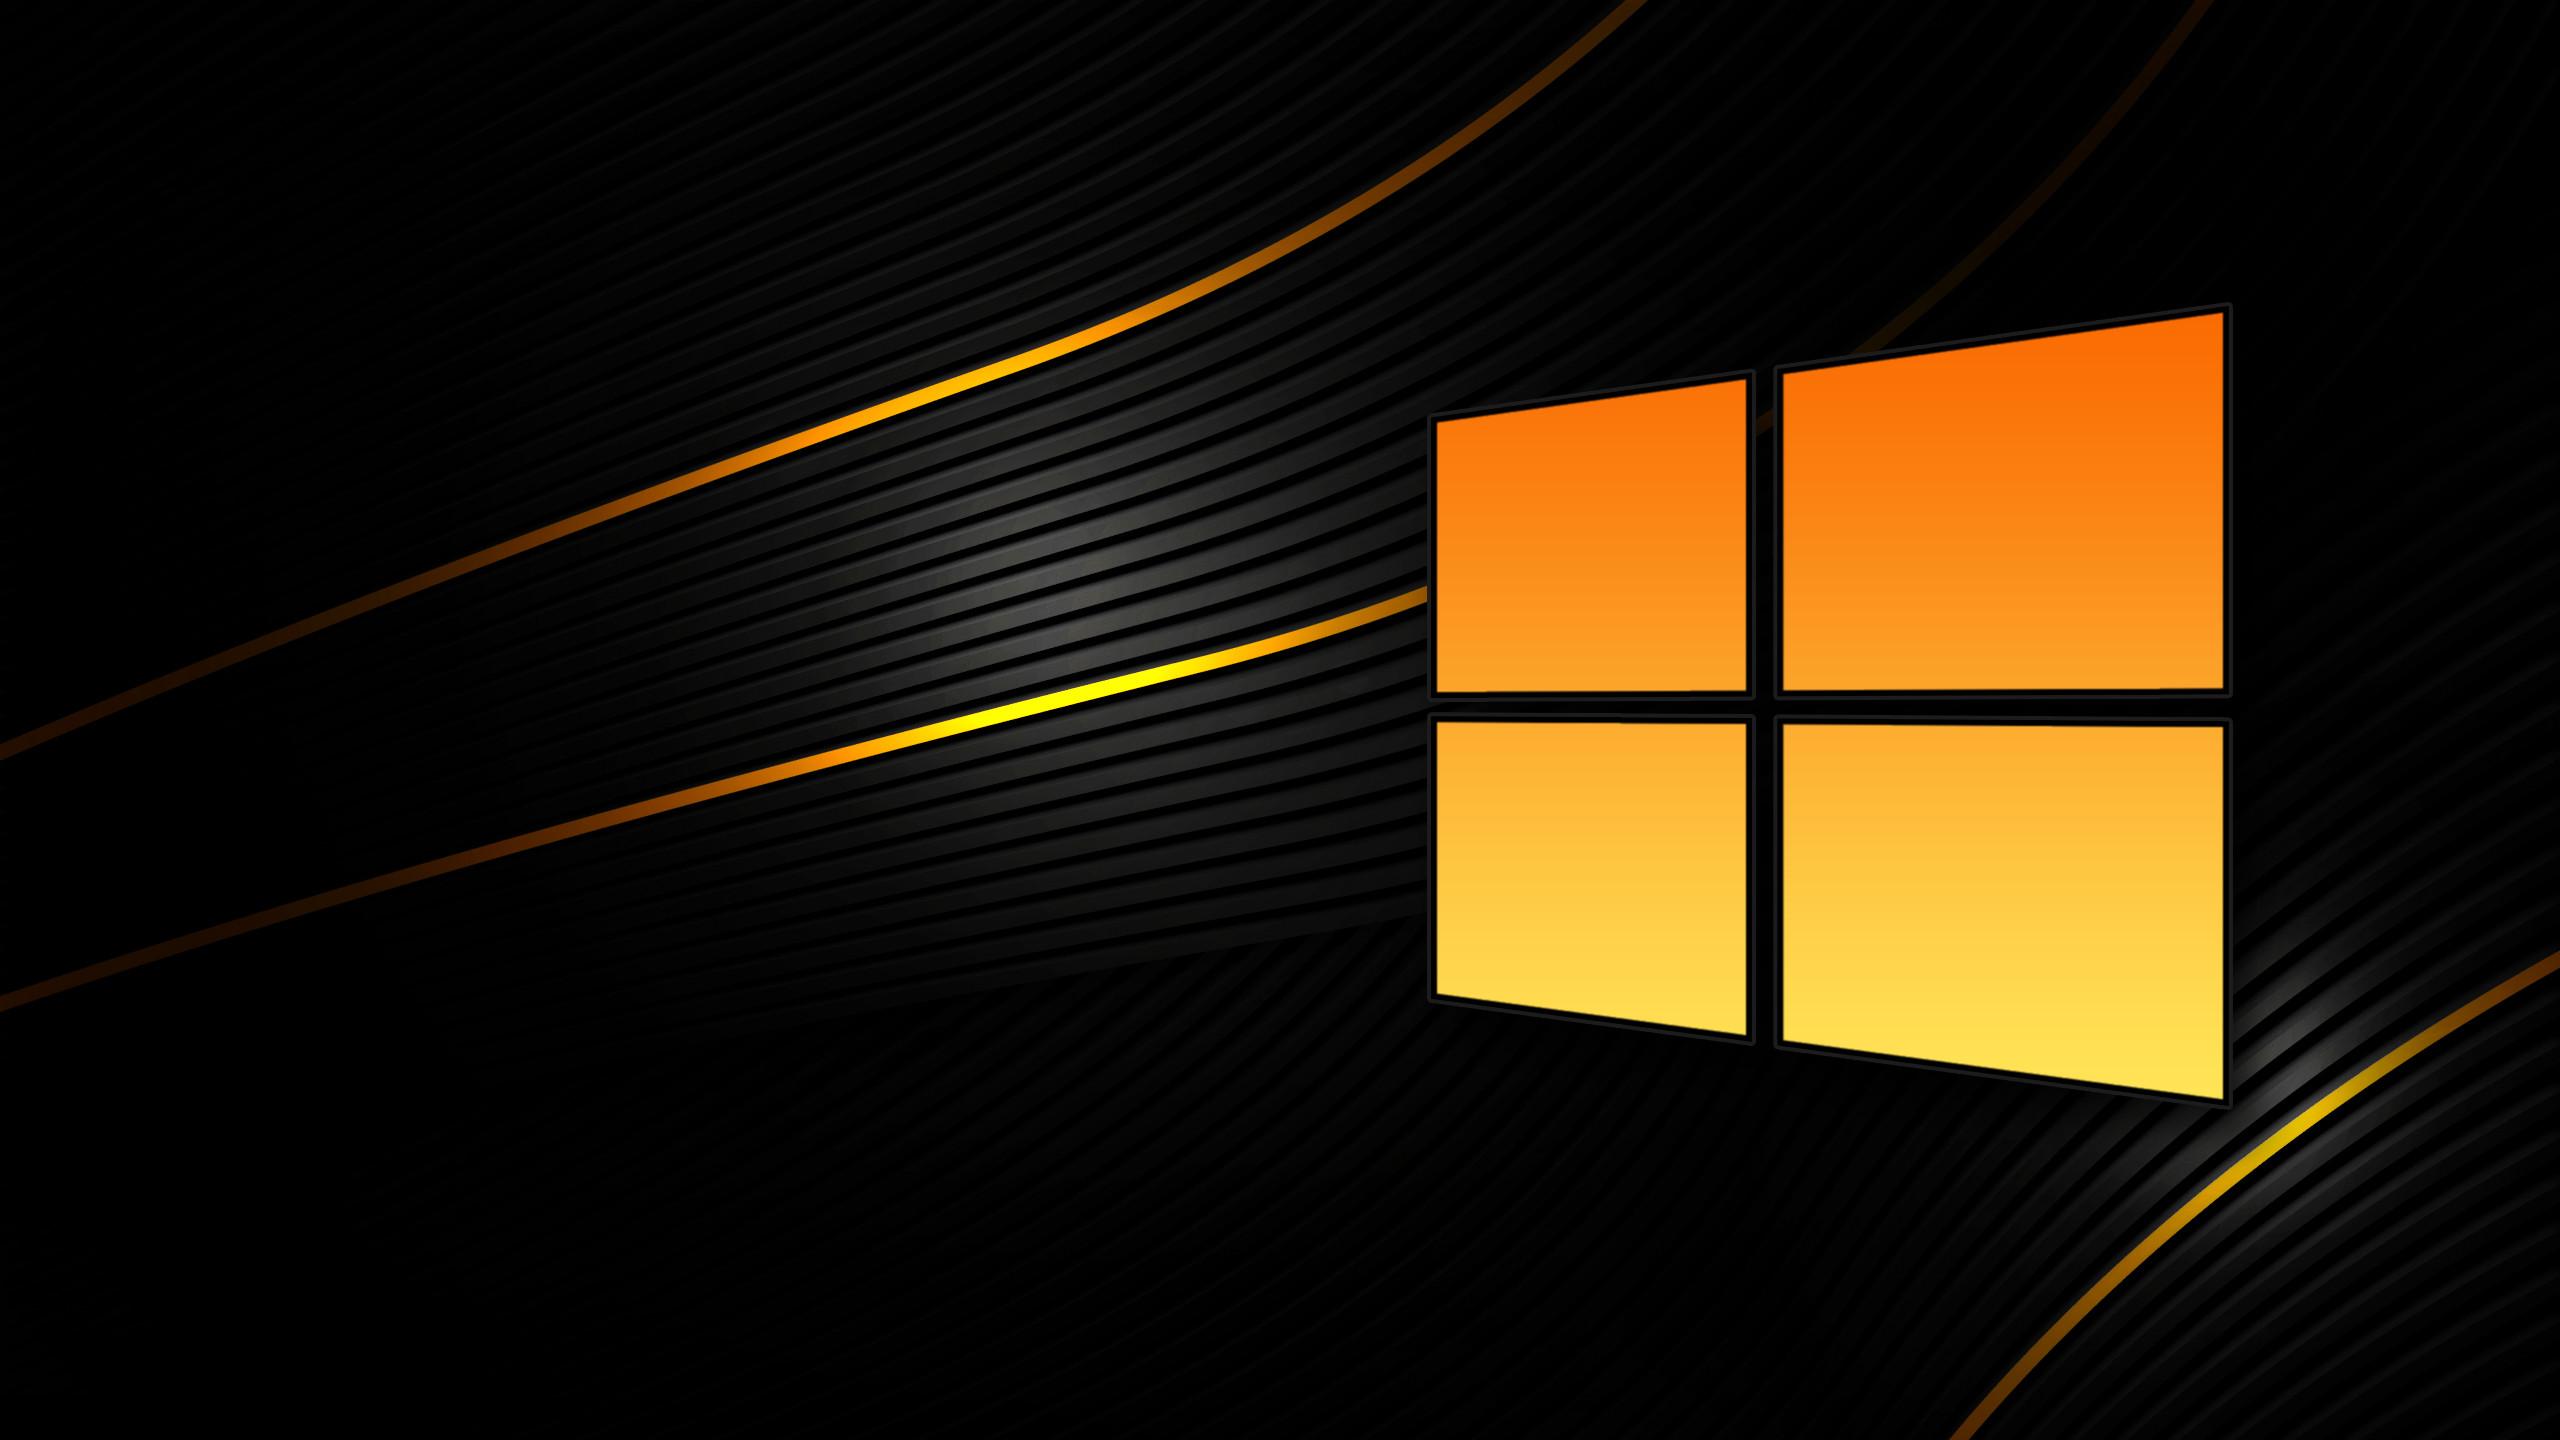 Good HD Wallpapers Collection of Lockscreen Windows 10 – 2560×1440, January  25, 2012